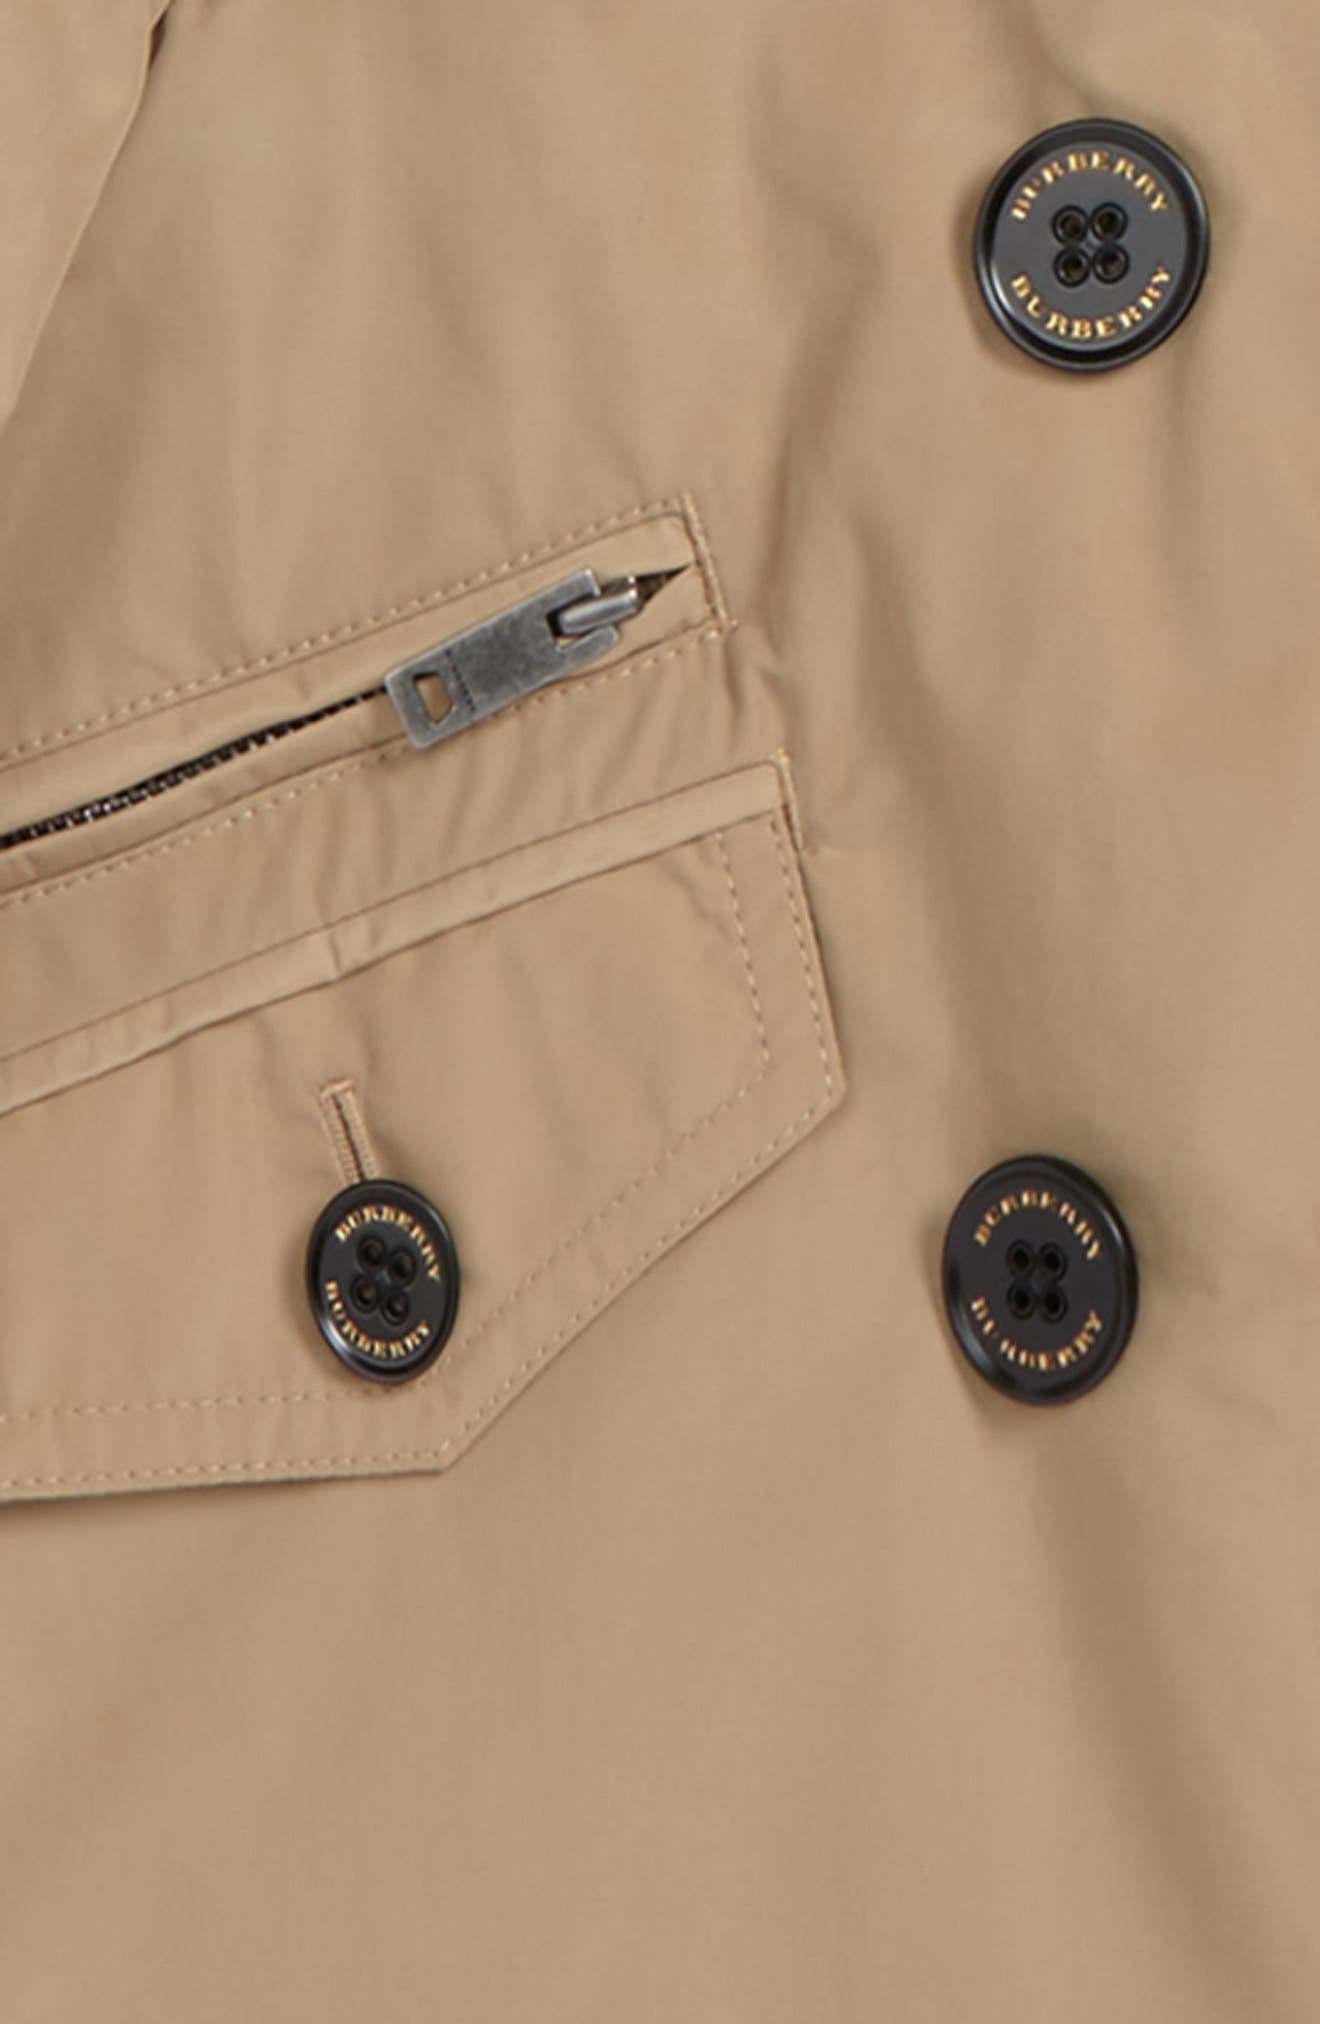 Margeretta Hooded Jacket,                             Alternate thumbnail 2, color,                             255